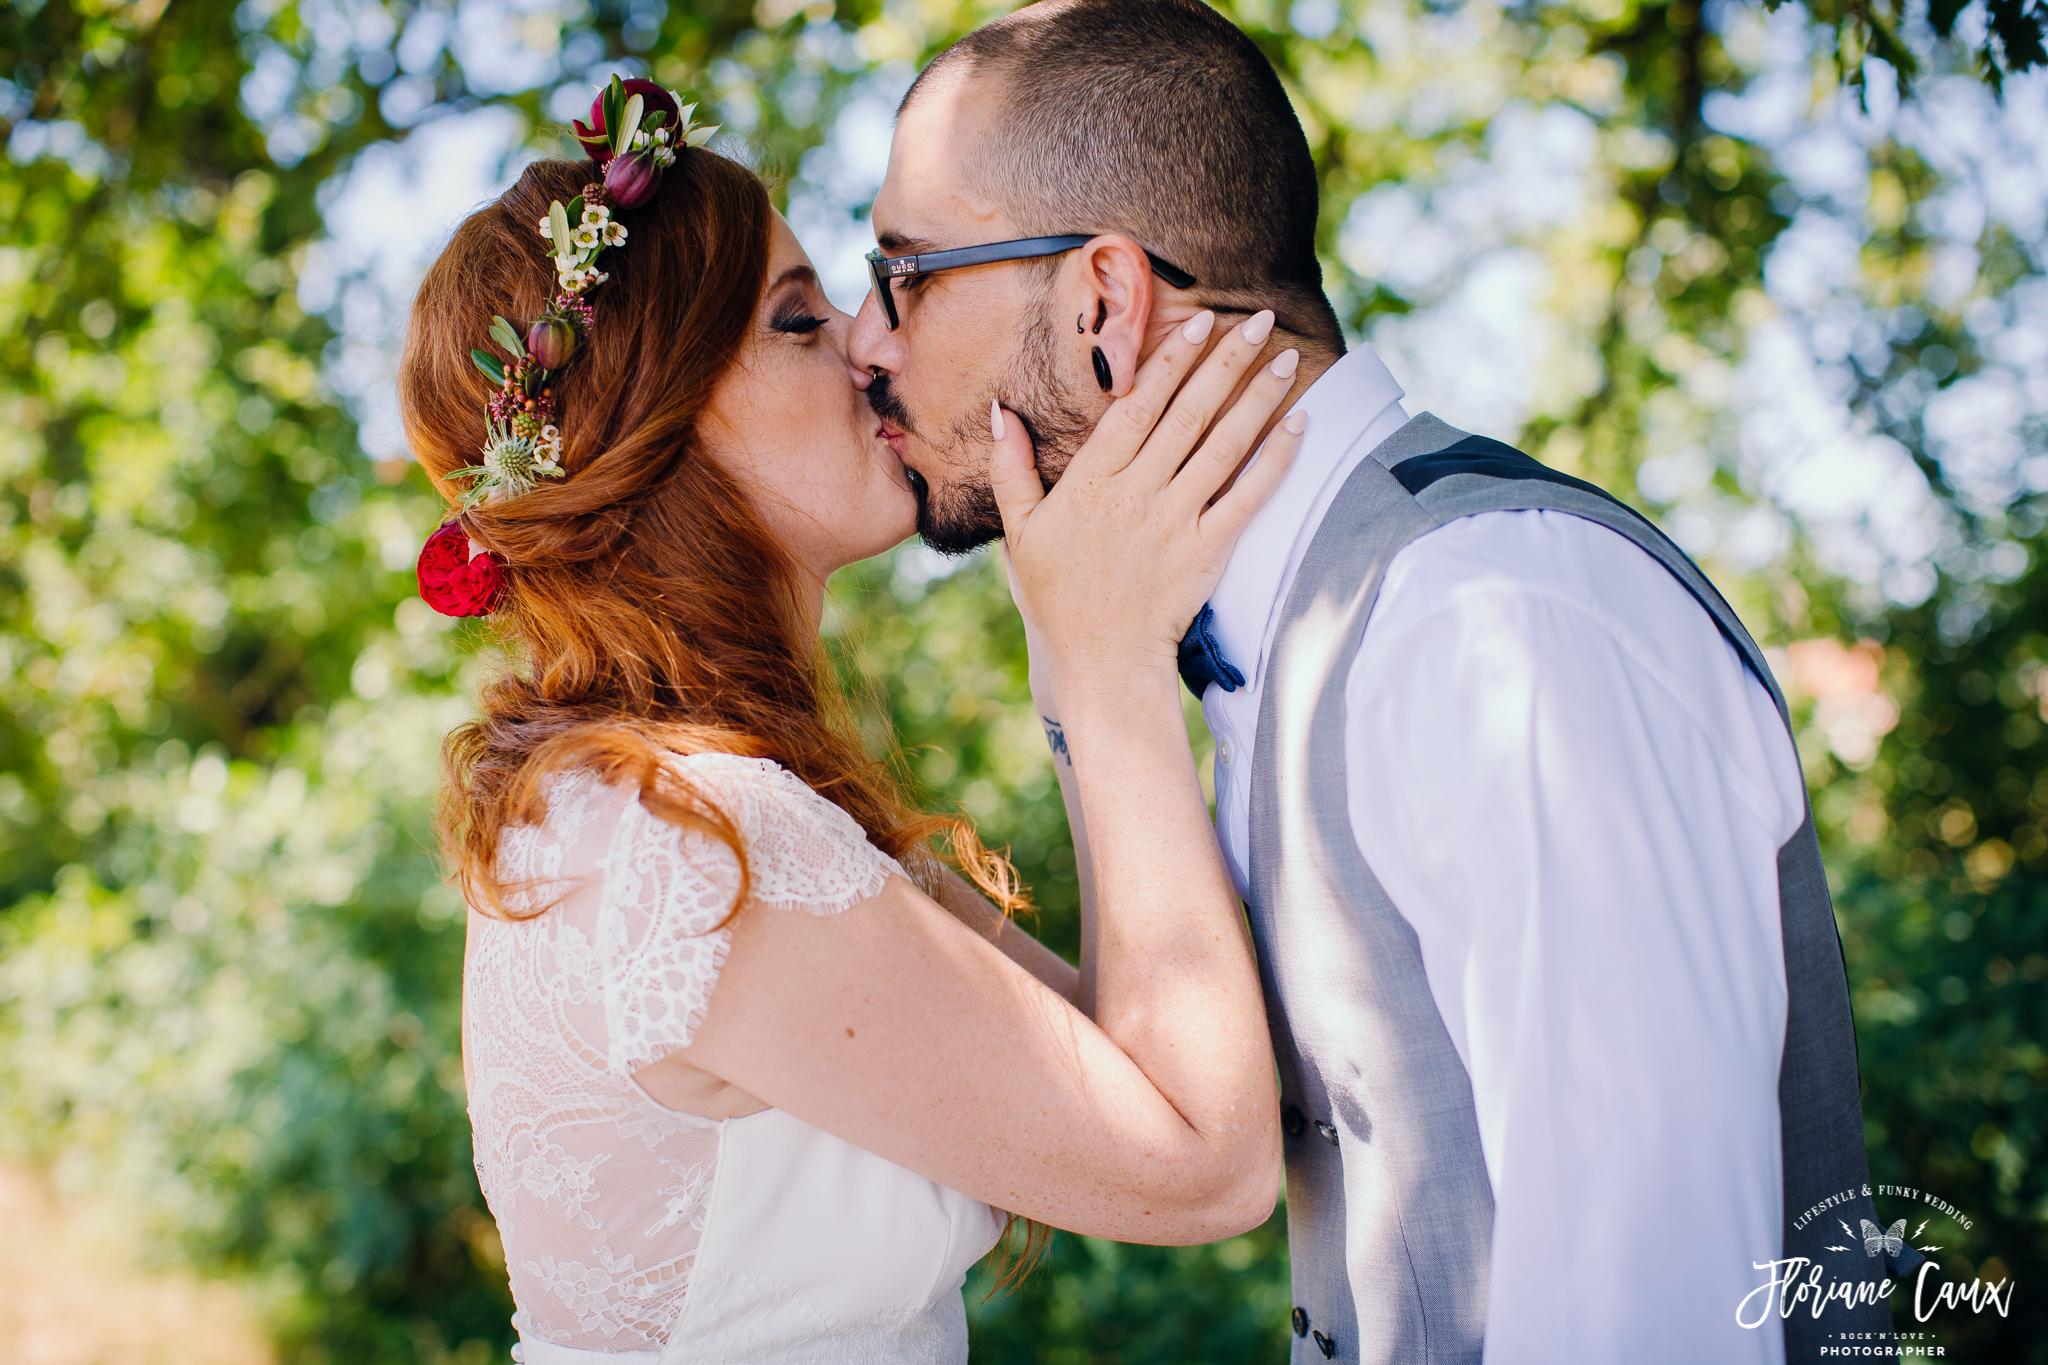 photographe-mariage-toulouse-rocknroll-maries-tatoues-floriane-caux-22